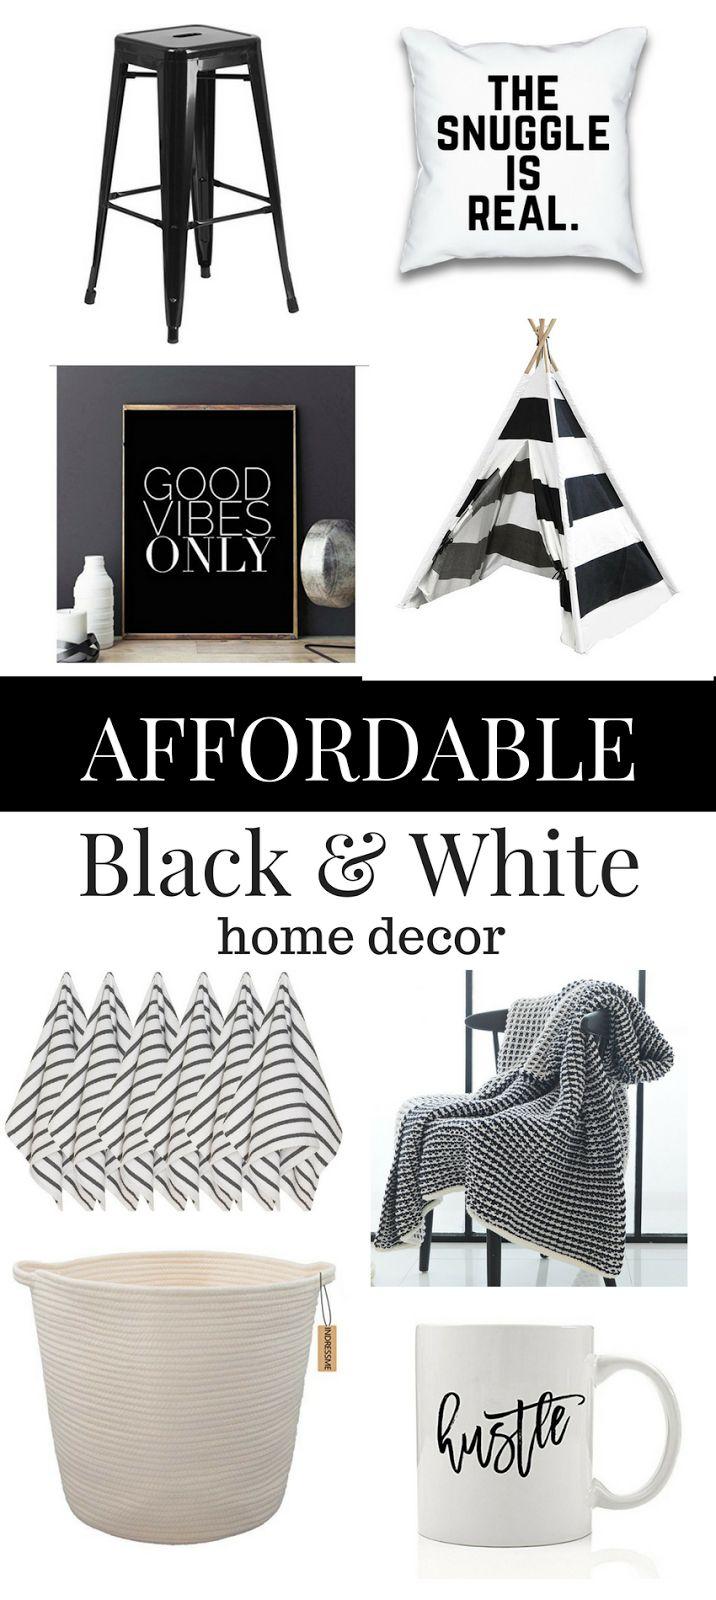 22 Black and White Budget Friendly Home Decor Pieces You'll Love! Black and White Home Decor. Black and White Accessories. Decorating in Black and White. Black and White Pillows. Black and White Stripes. Black and White Decorations.